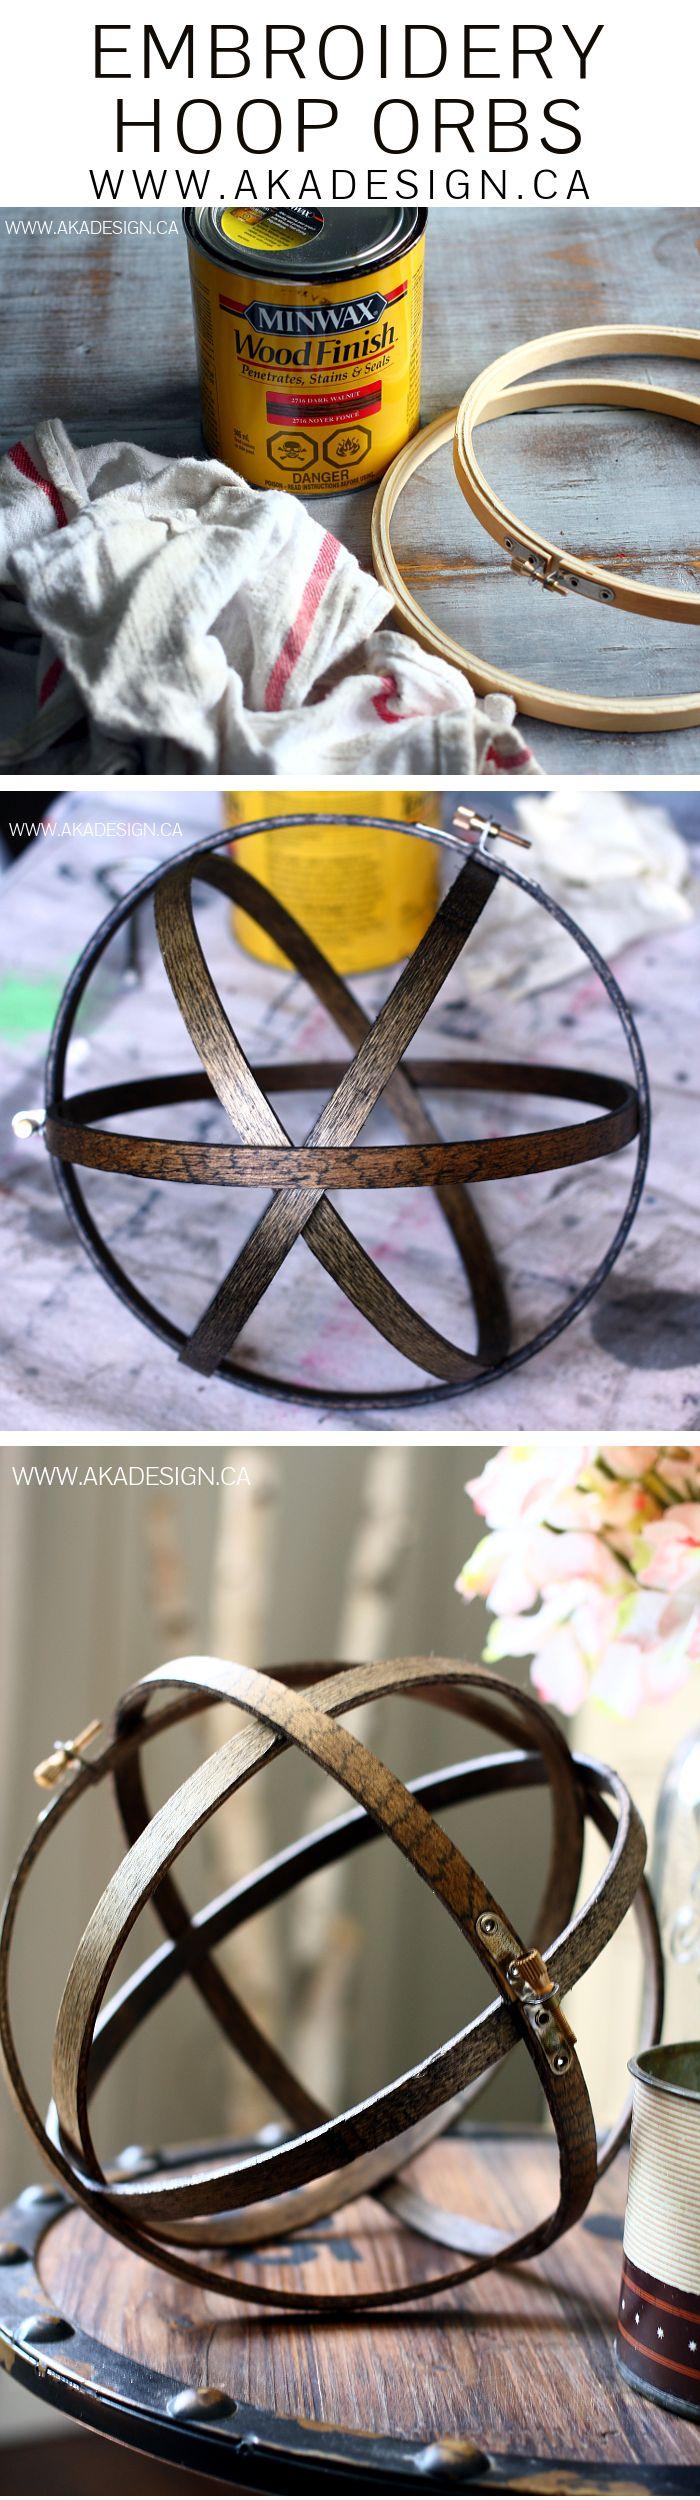 embroidery hoop orbs easily make your own deko pinterest einrichten selber machen. Black Bedroom Furniture Sets. Home Design Ideas